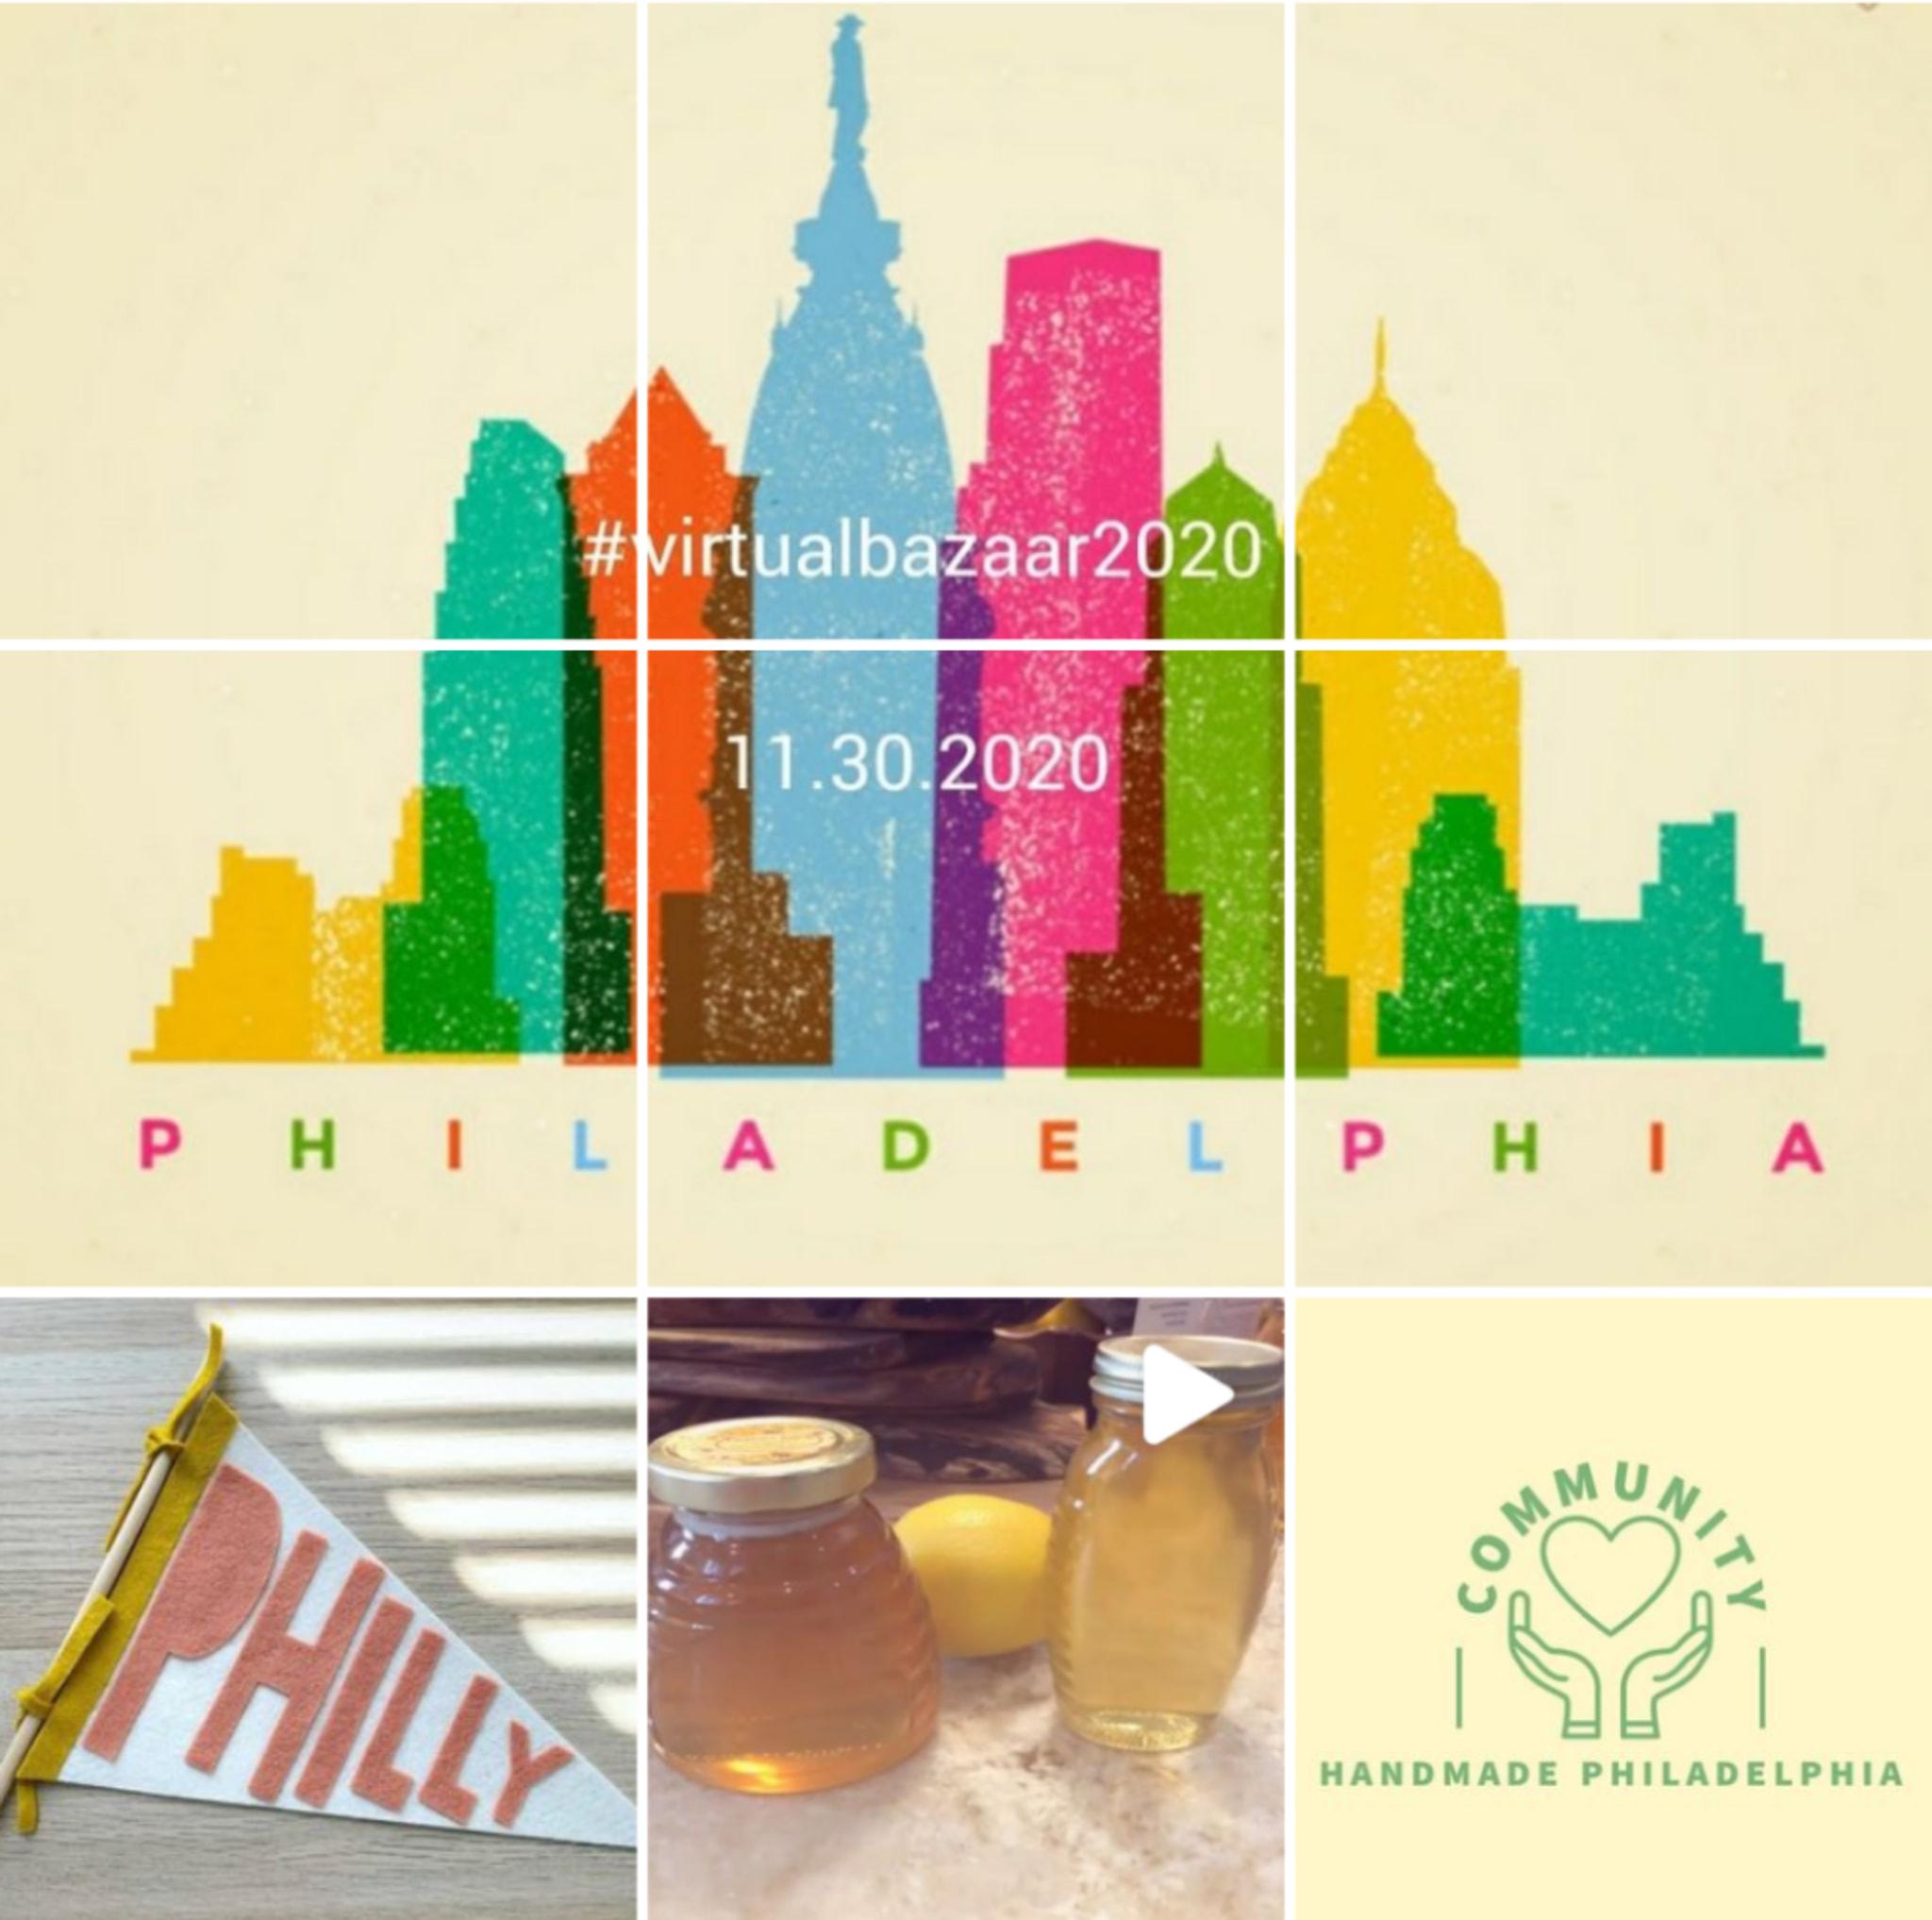 Handmade philadelphia virtual bazaar